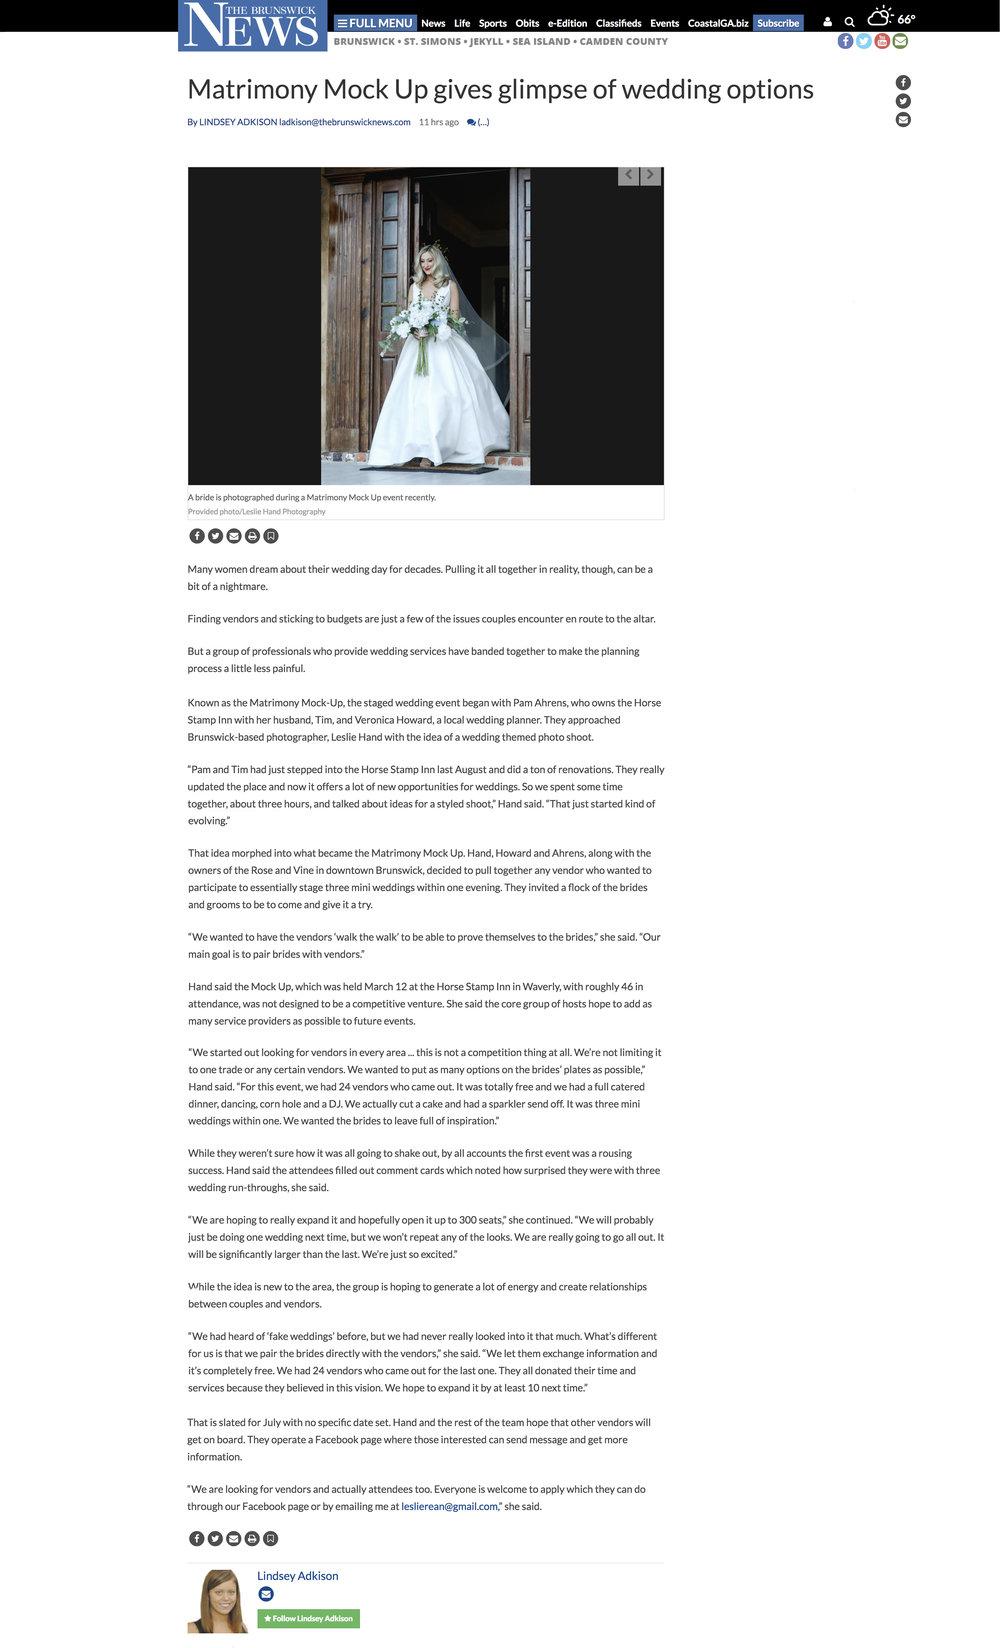 MatrimonyMockUpBrunswickNews.jpg